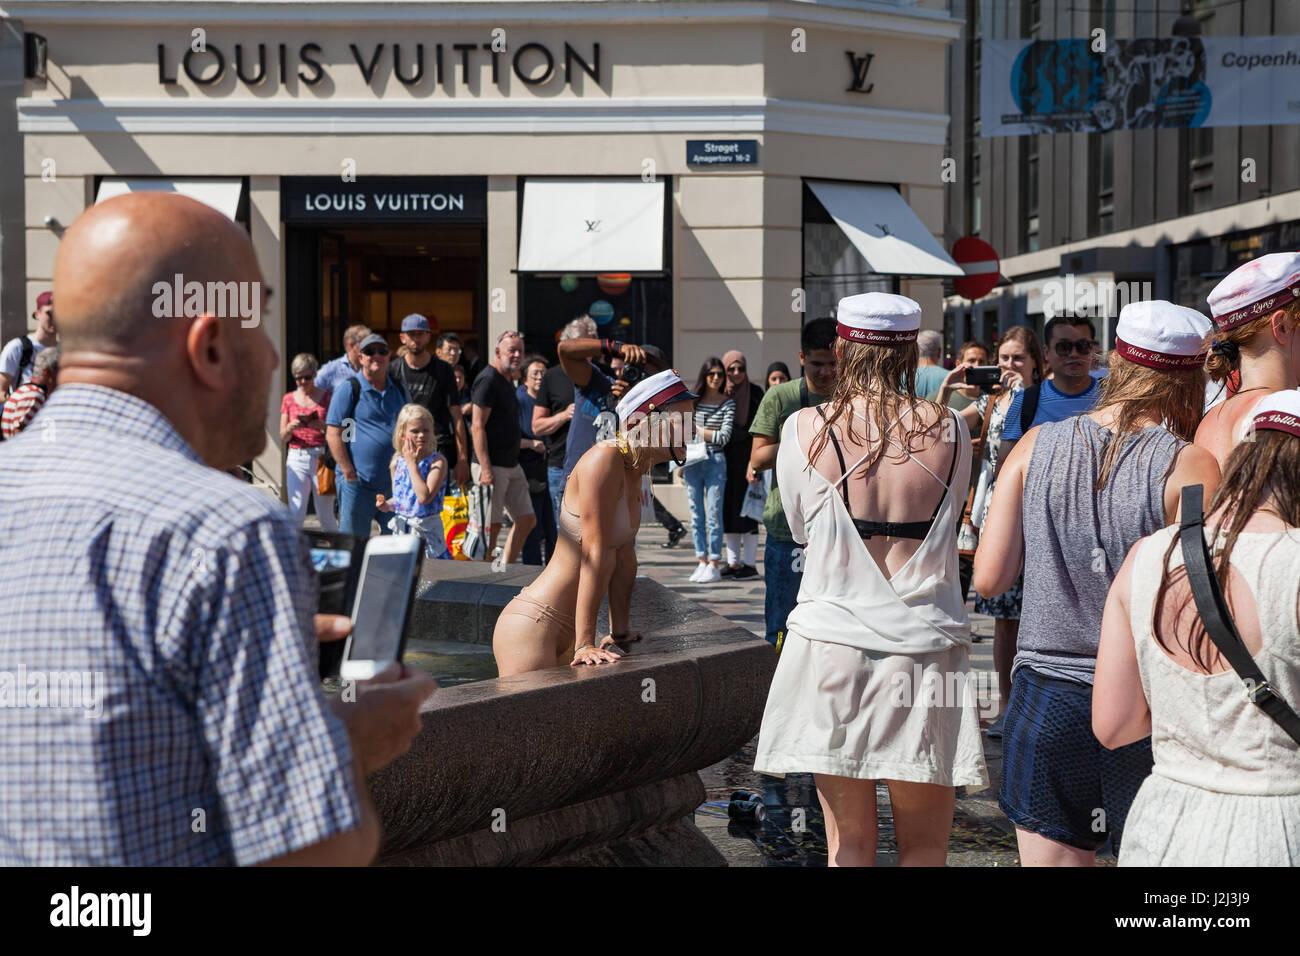 COPENHAGEN, DENMARK - 26 JUN 2016: Students celebrate their high school graduation swimming and dancing in fountain - Stock Image